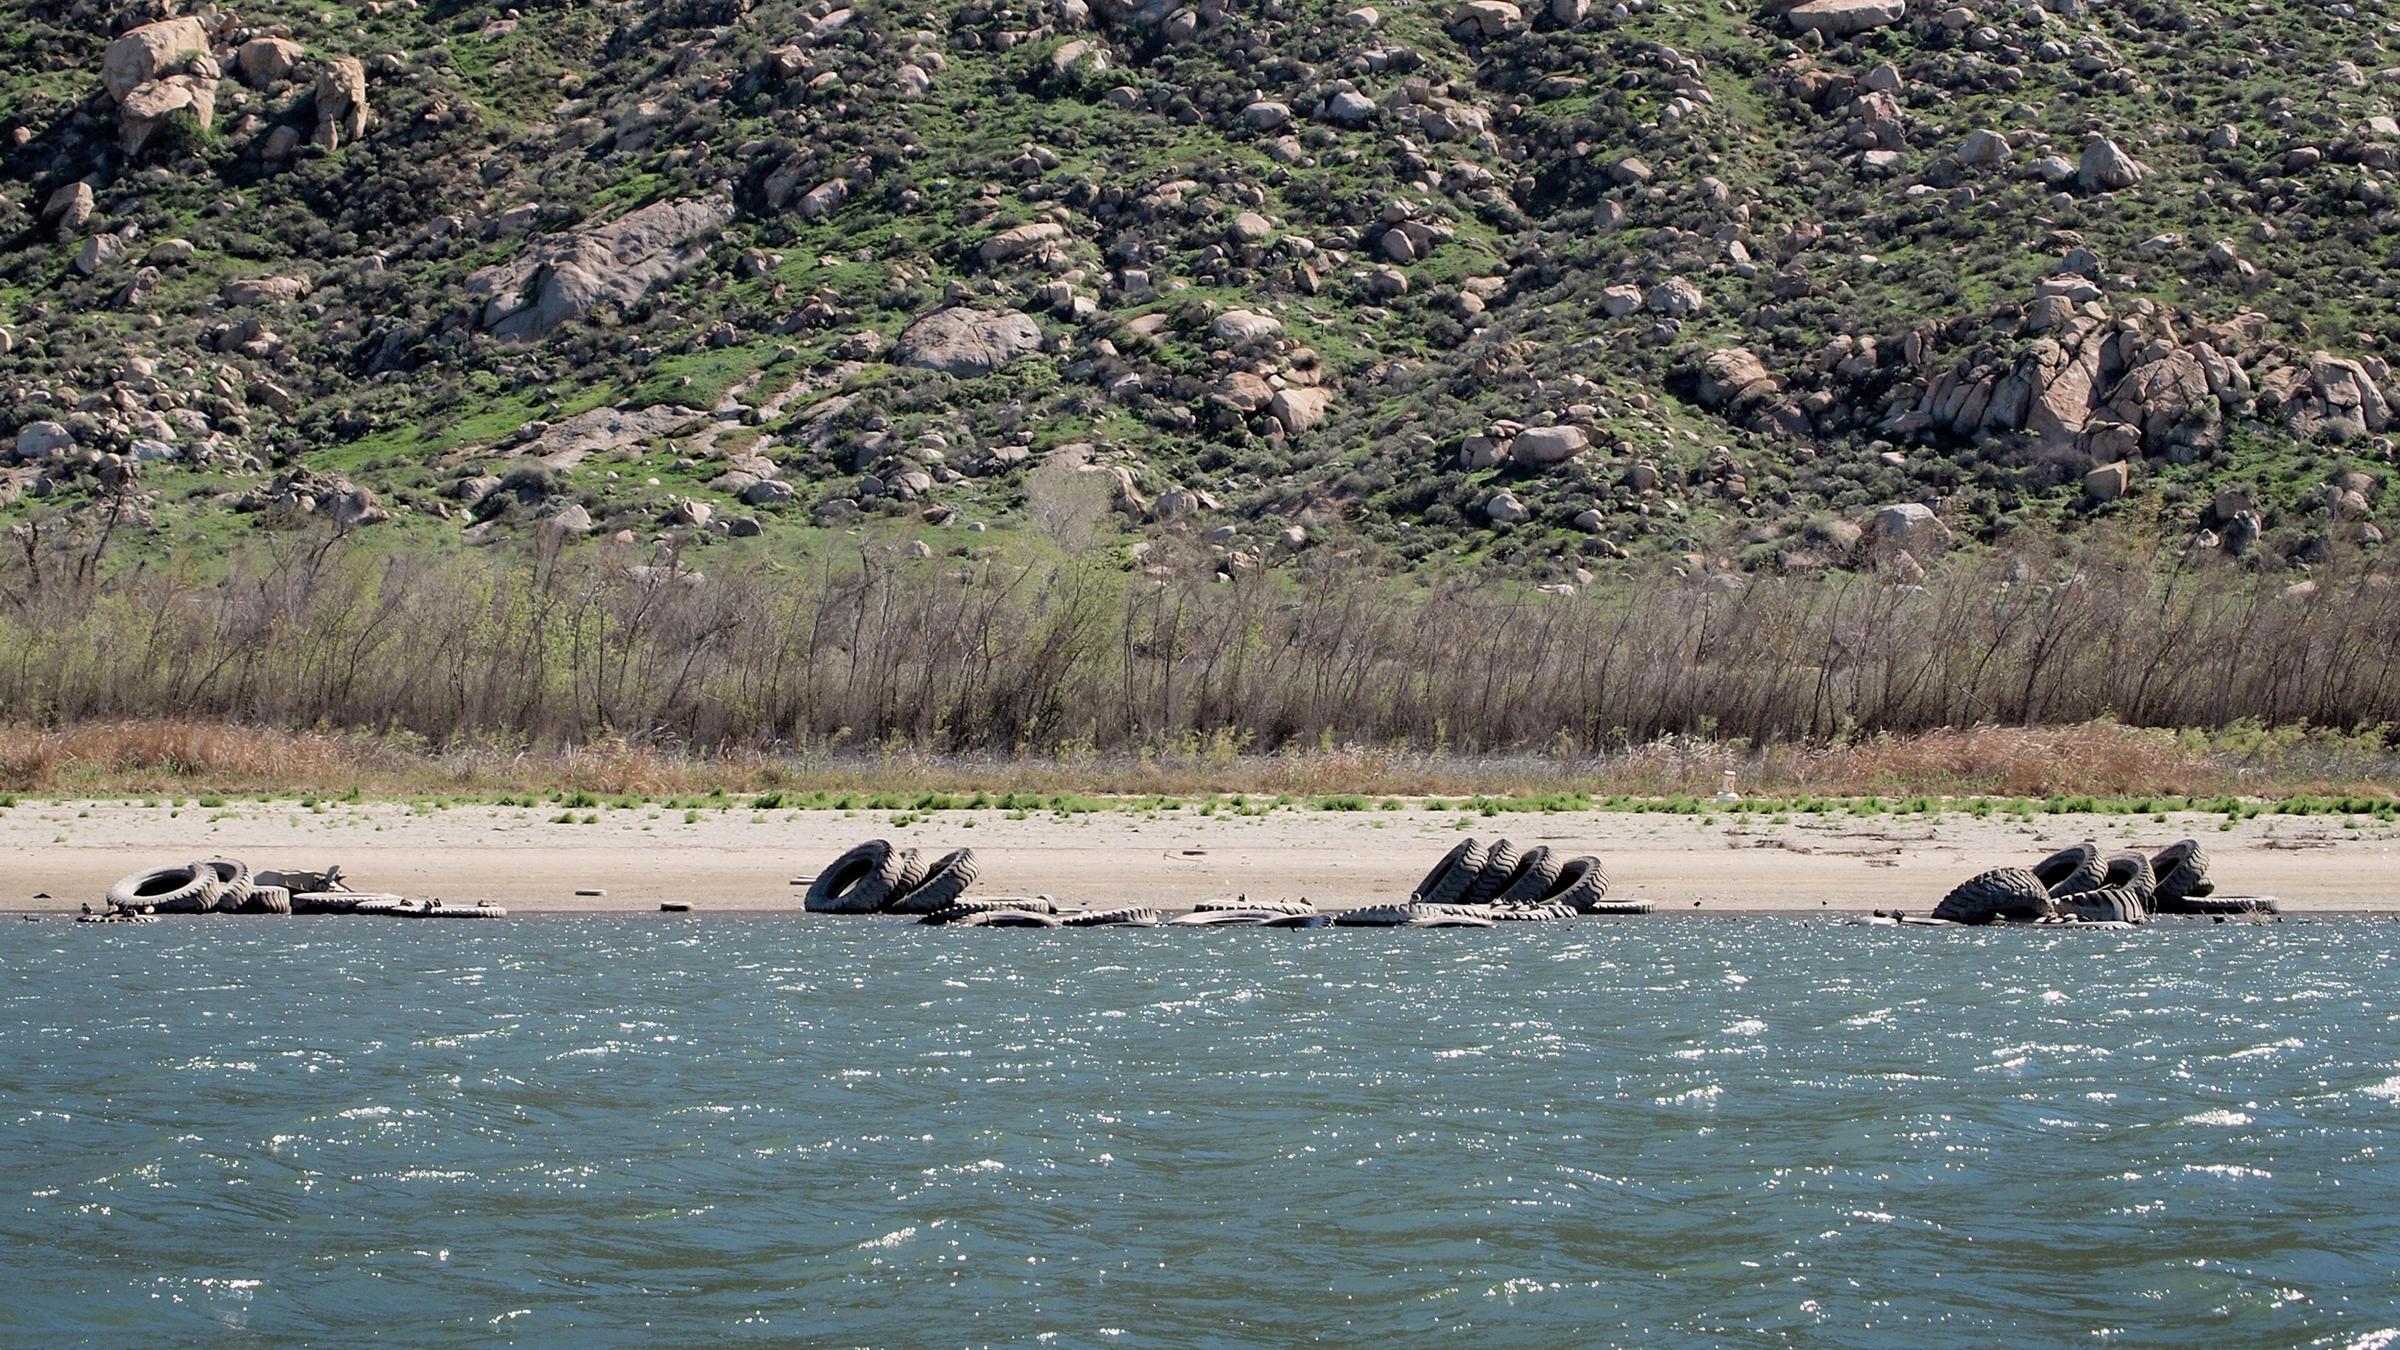 California 39 s drought exposes long hidden detritus kera news for Perris lake fishing report